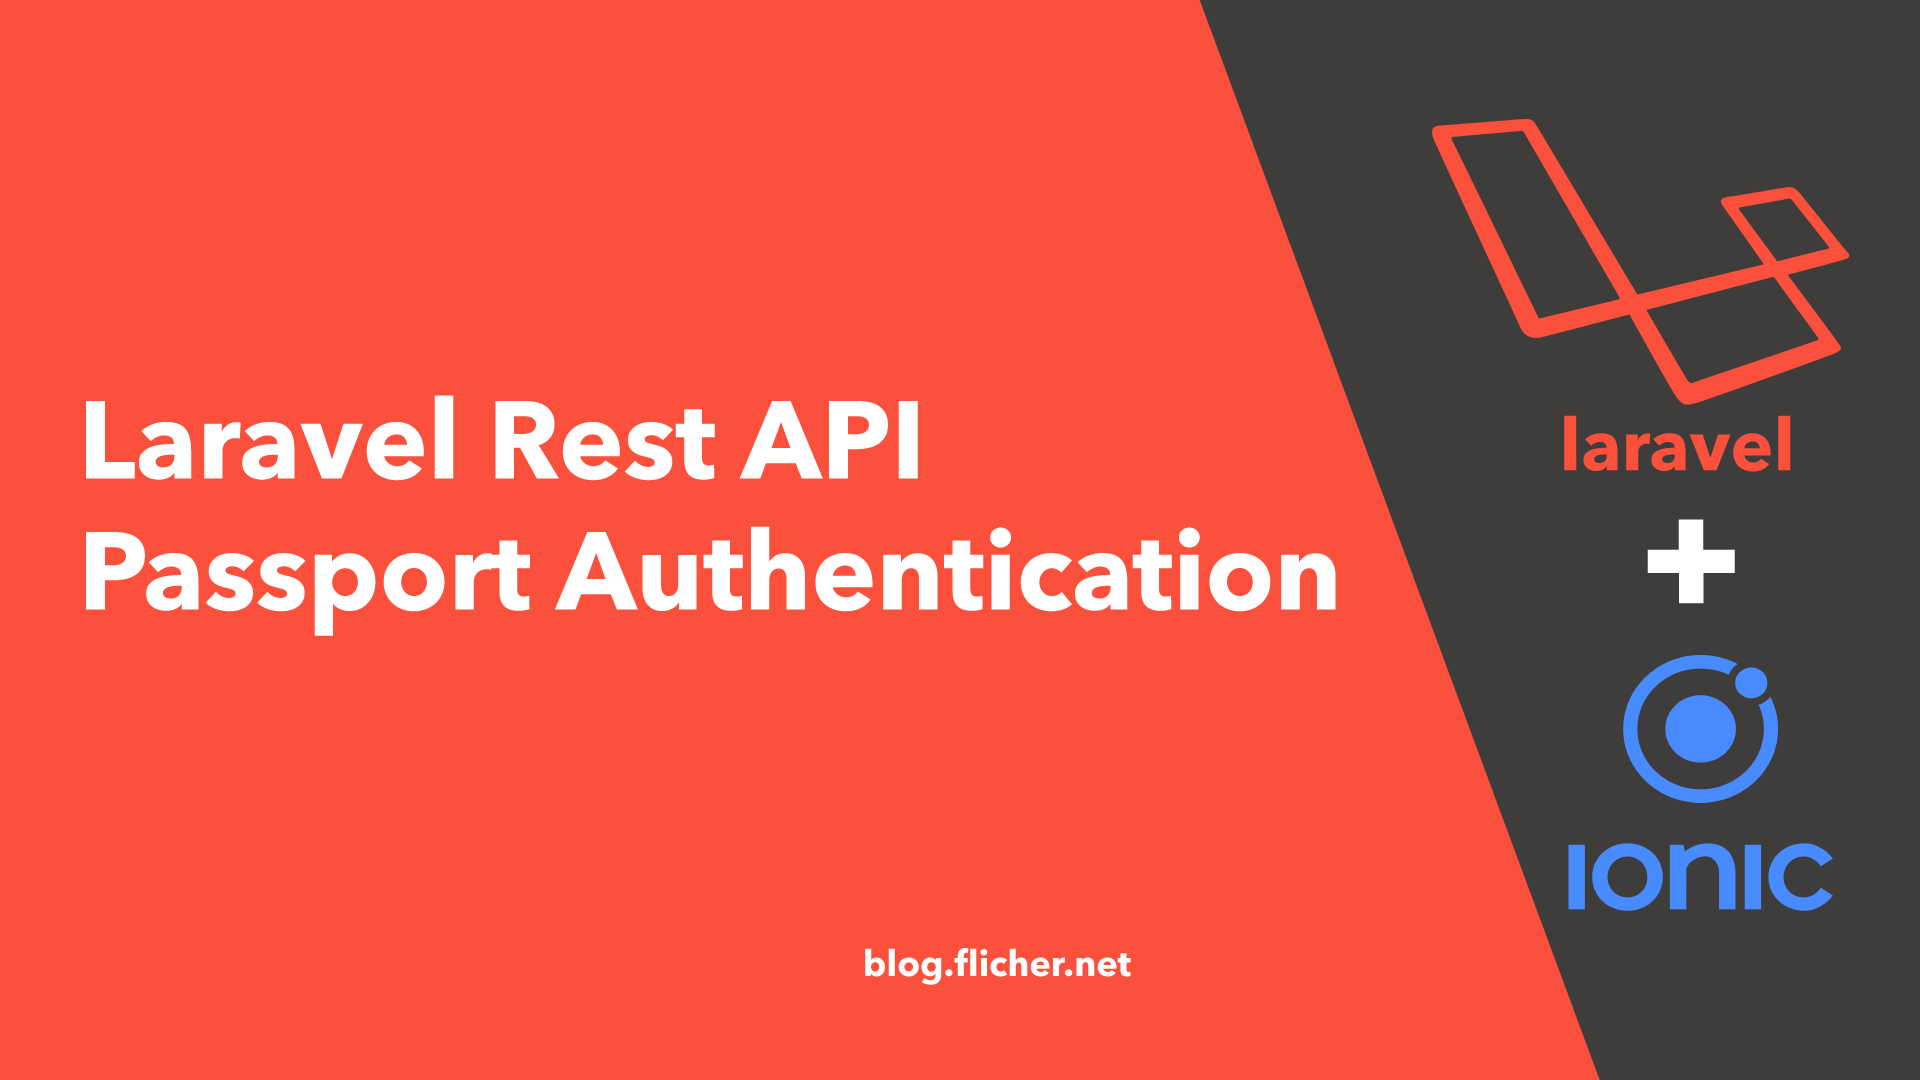 Laravel Rest API Passport Authentication for Ionic App